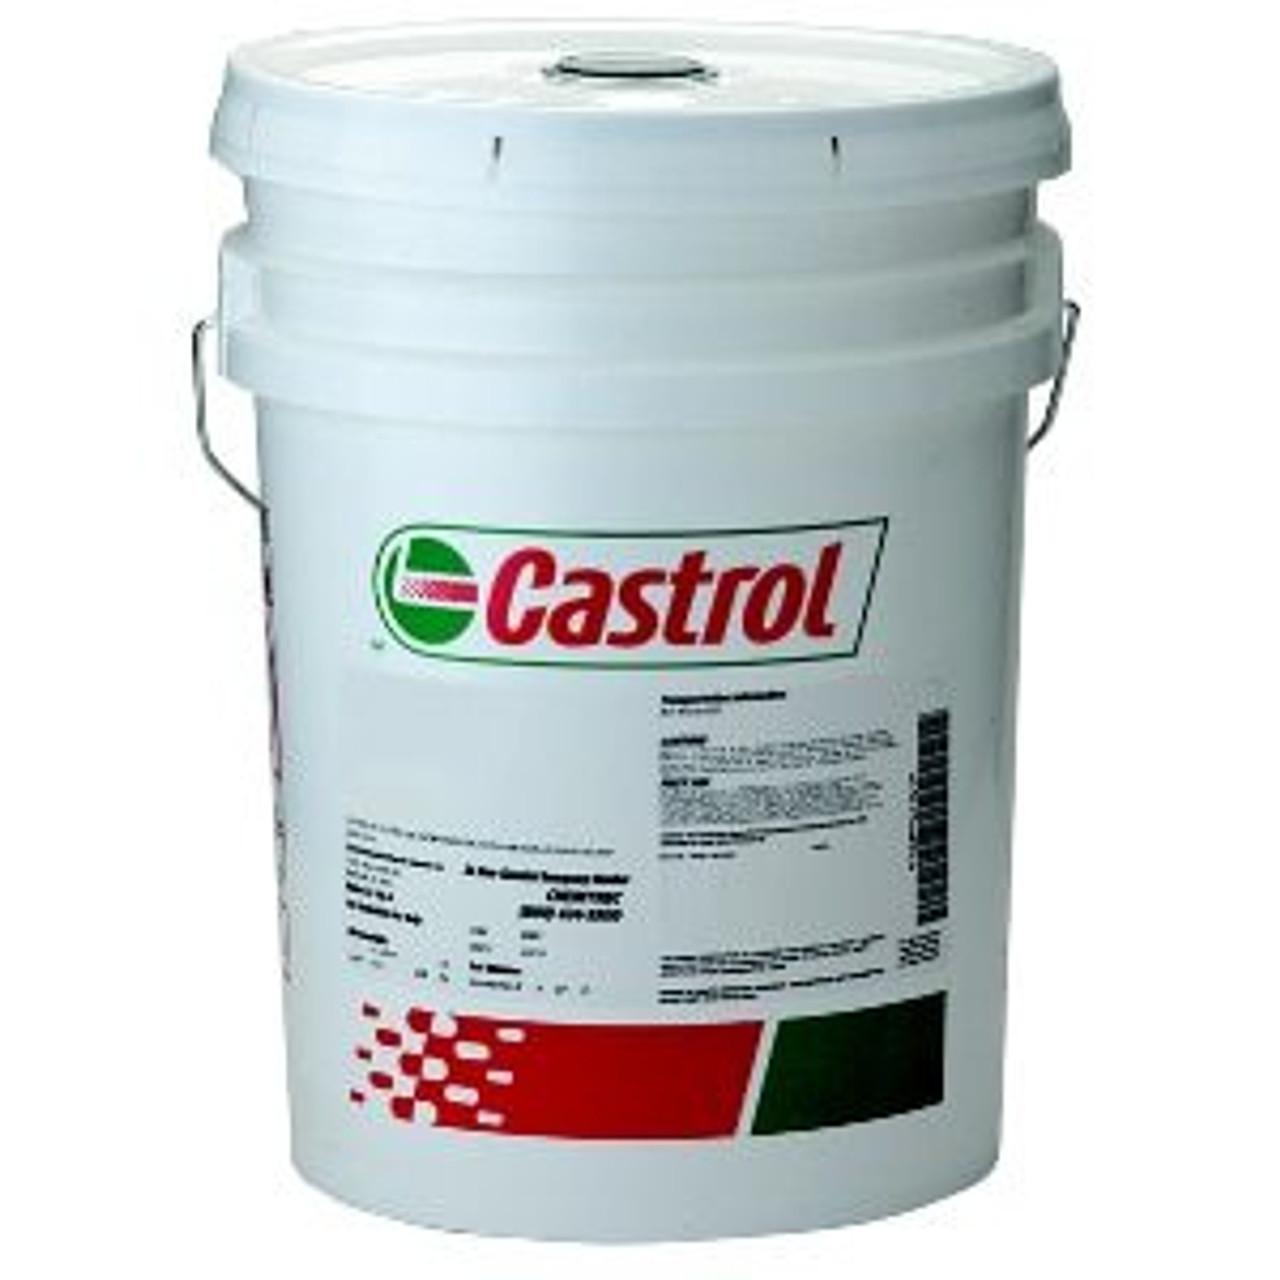 Castrol LubeCon ® I/M 200 Dry Film Conveyor Lubricant - 5 Gallon Pail